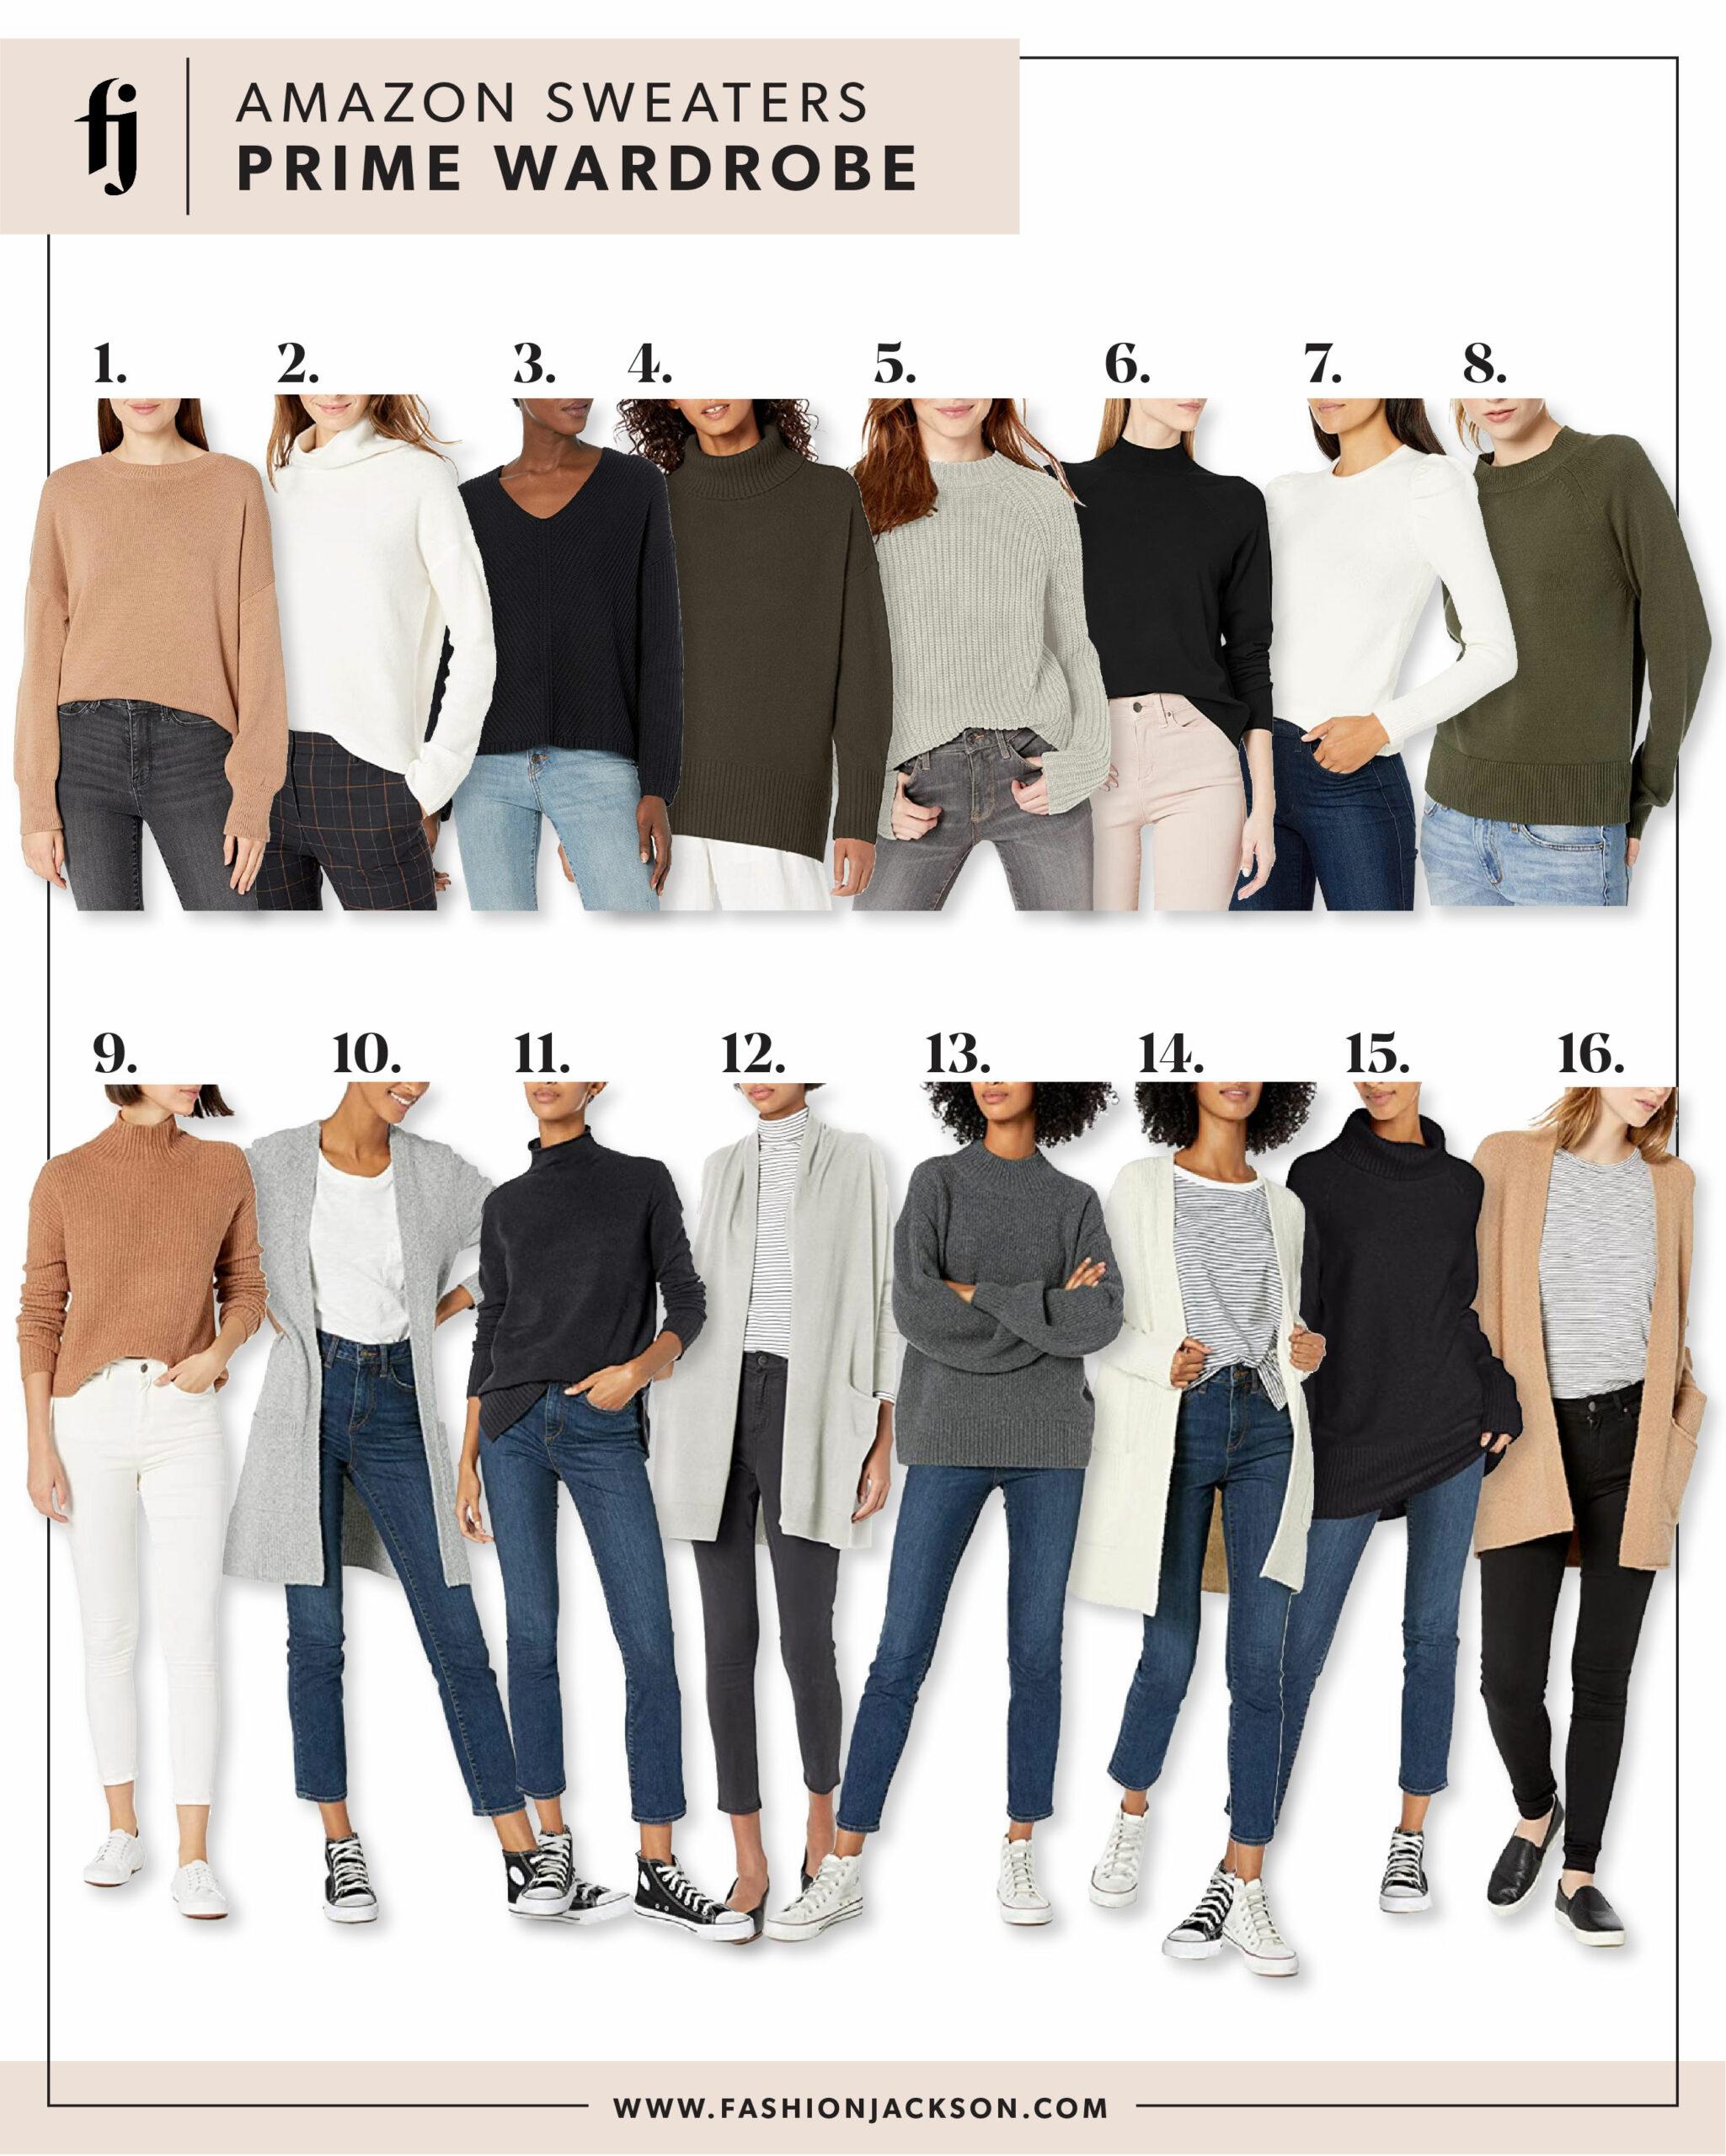 Amazon Prime Wardrobe Sweaters